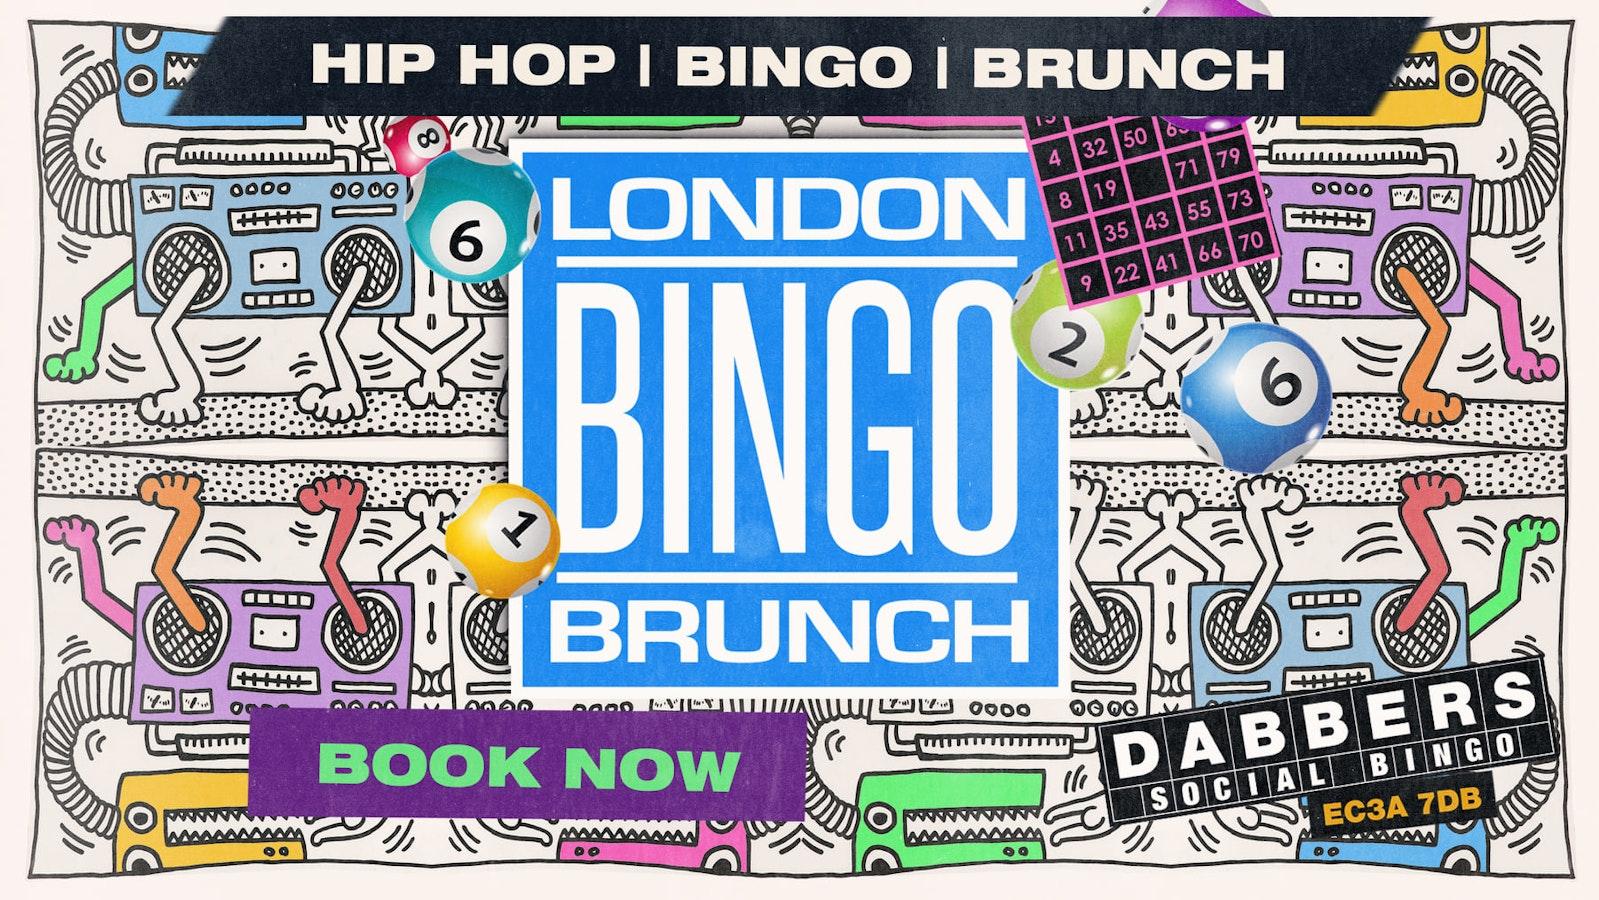 London Bingo Brunch: All Day Hip Hop Party & Bingo Brunch!